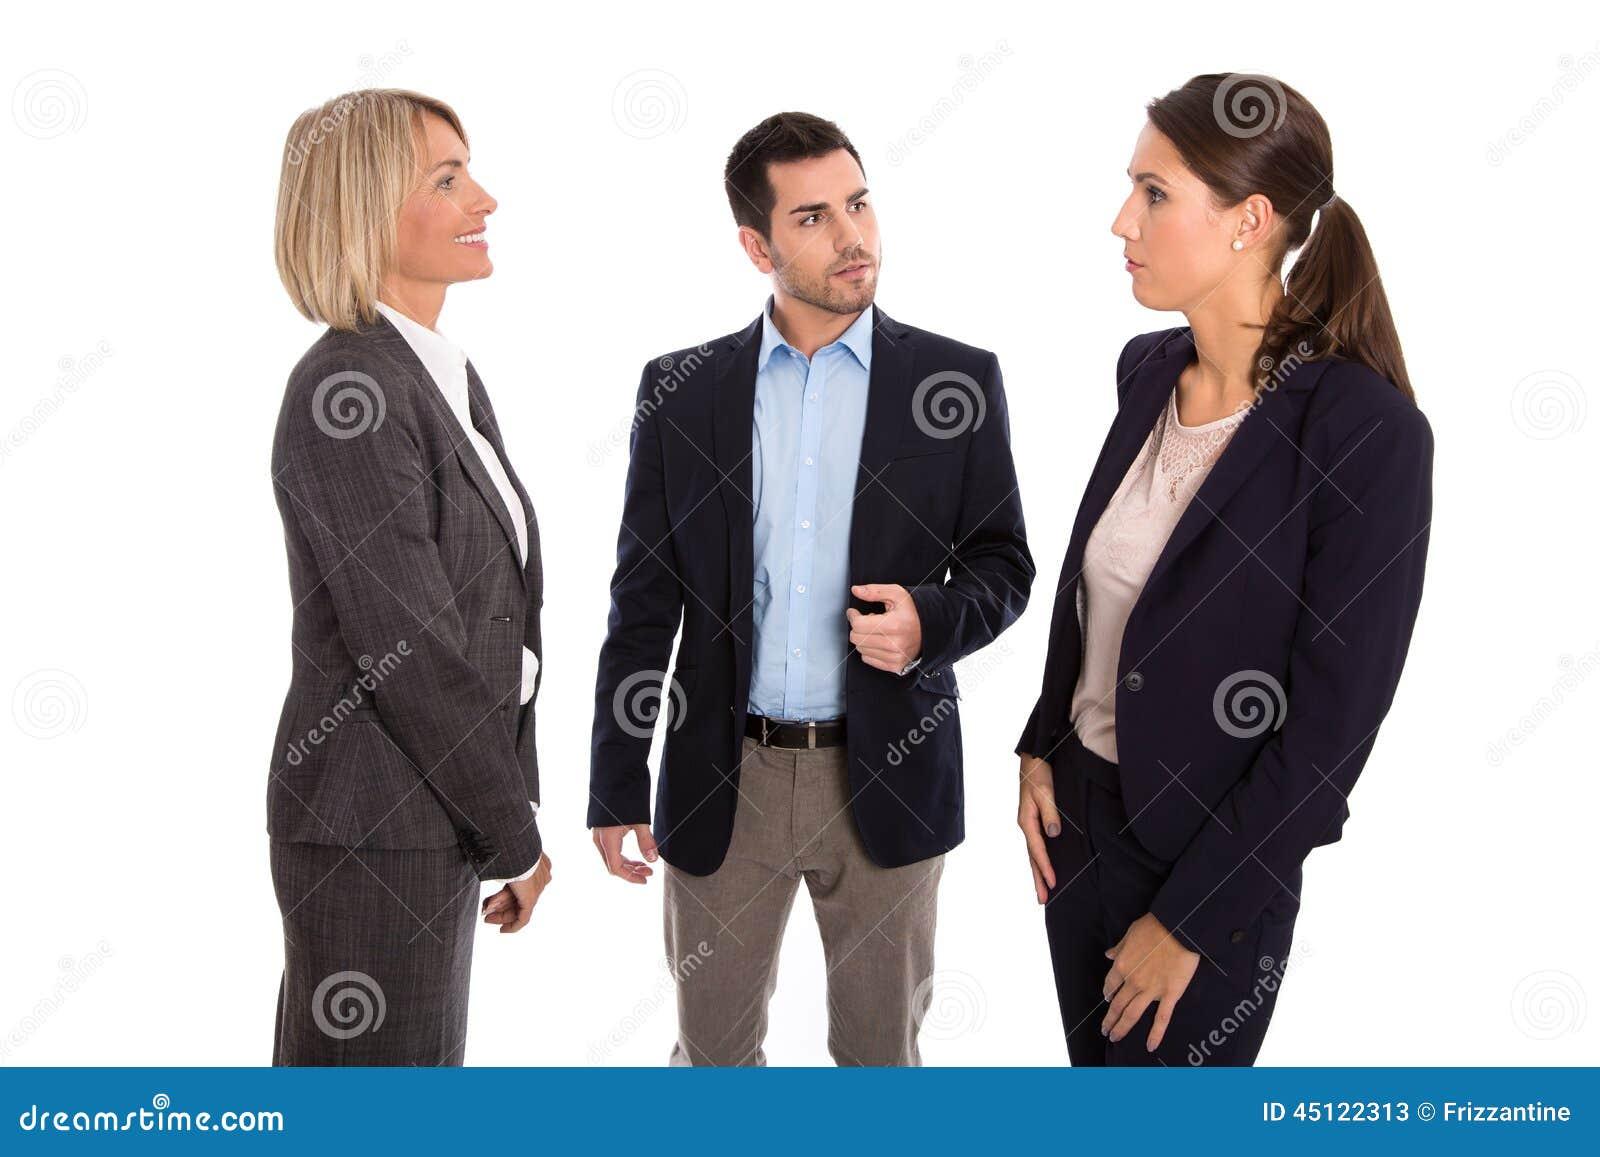 men vs women talk Men vs women when talking about sex paypal : akabili94@gmailcom.